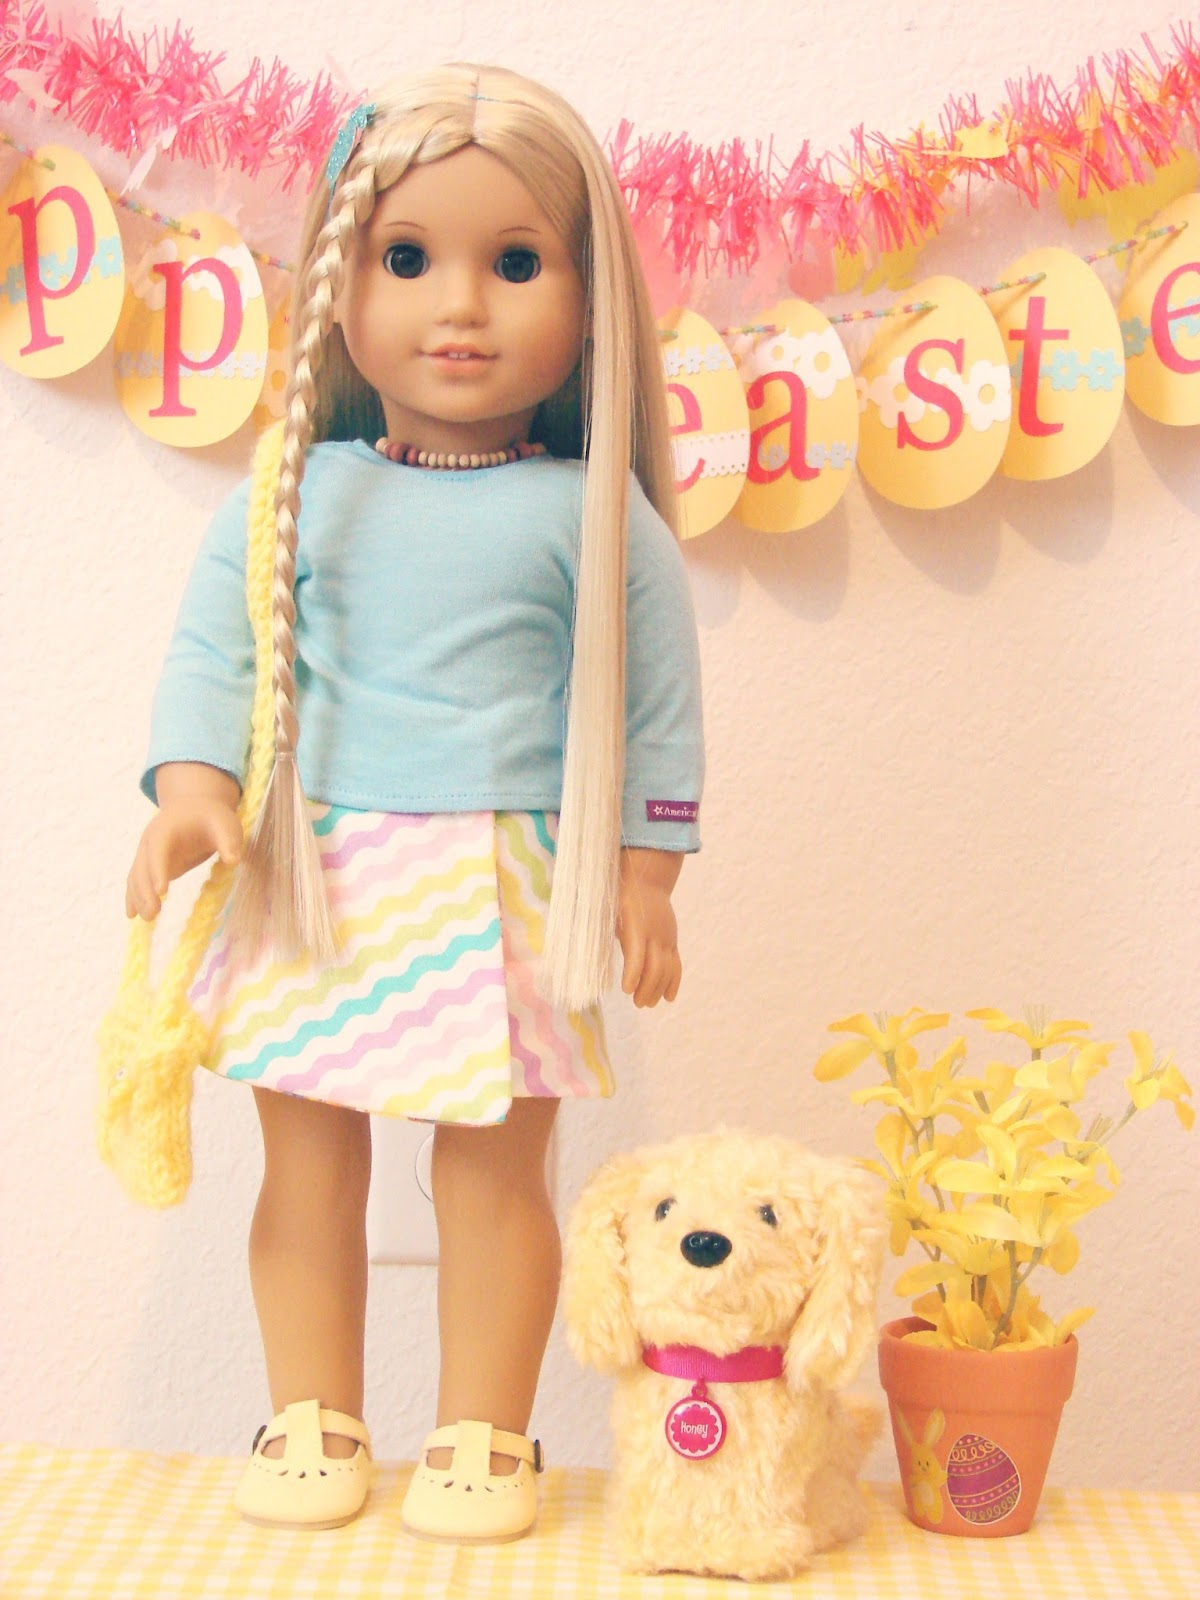 american girl doll play julie 39 s easter attire. Black Bedroom Furniture Sets. Home Design Ideas